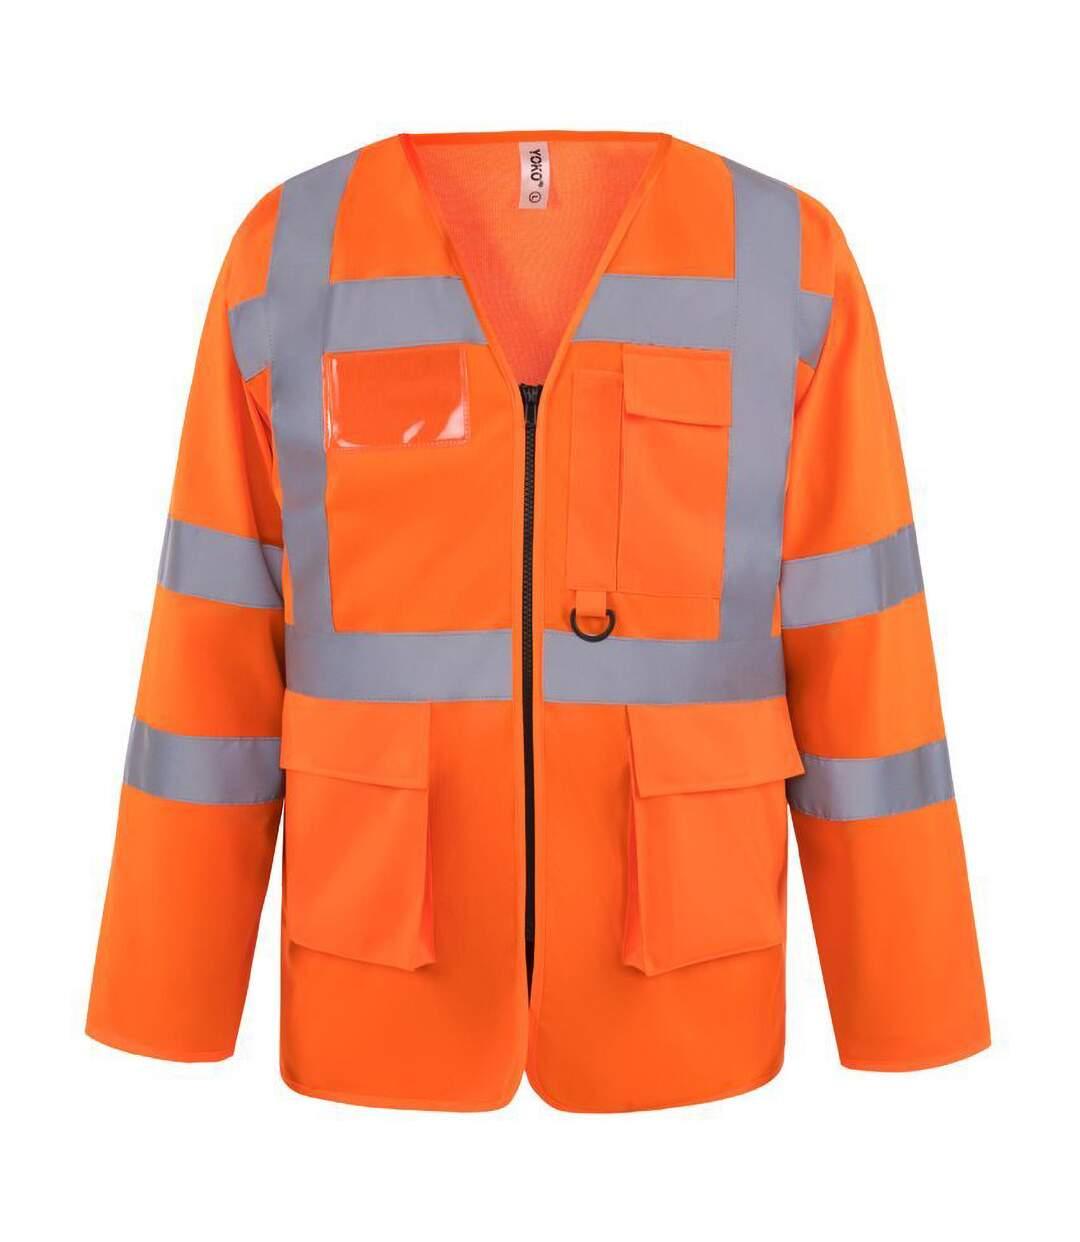 Yoko Mens Executive Hi-Vis Long Sleeve Safety Waistcoat (Pack of 2) (Hi Vis Orange) - UTBC4397